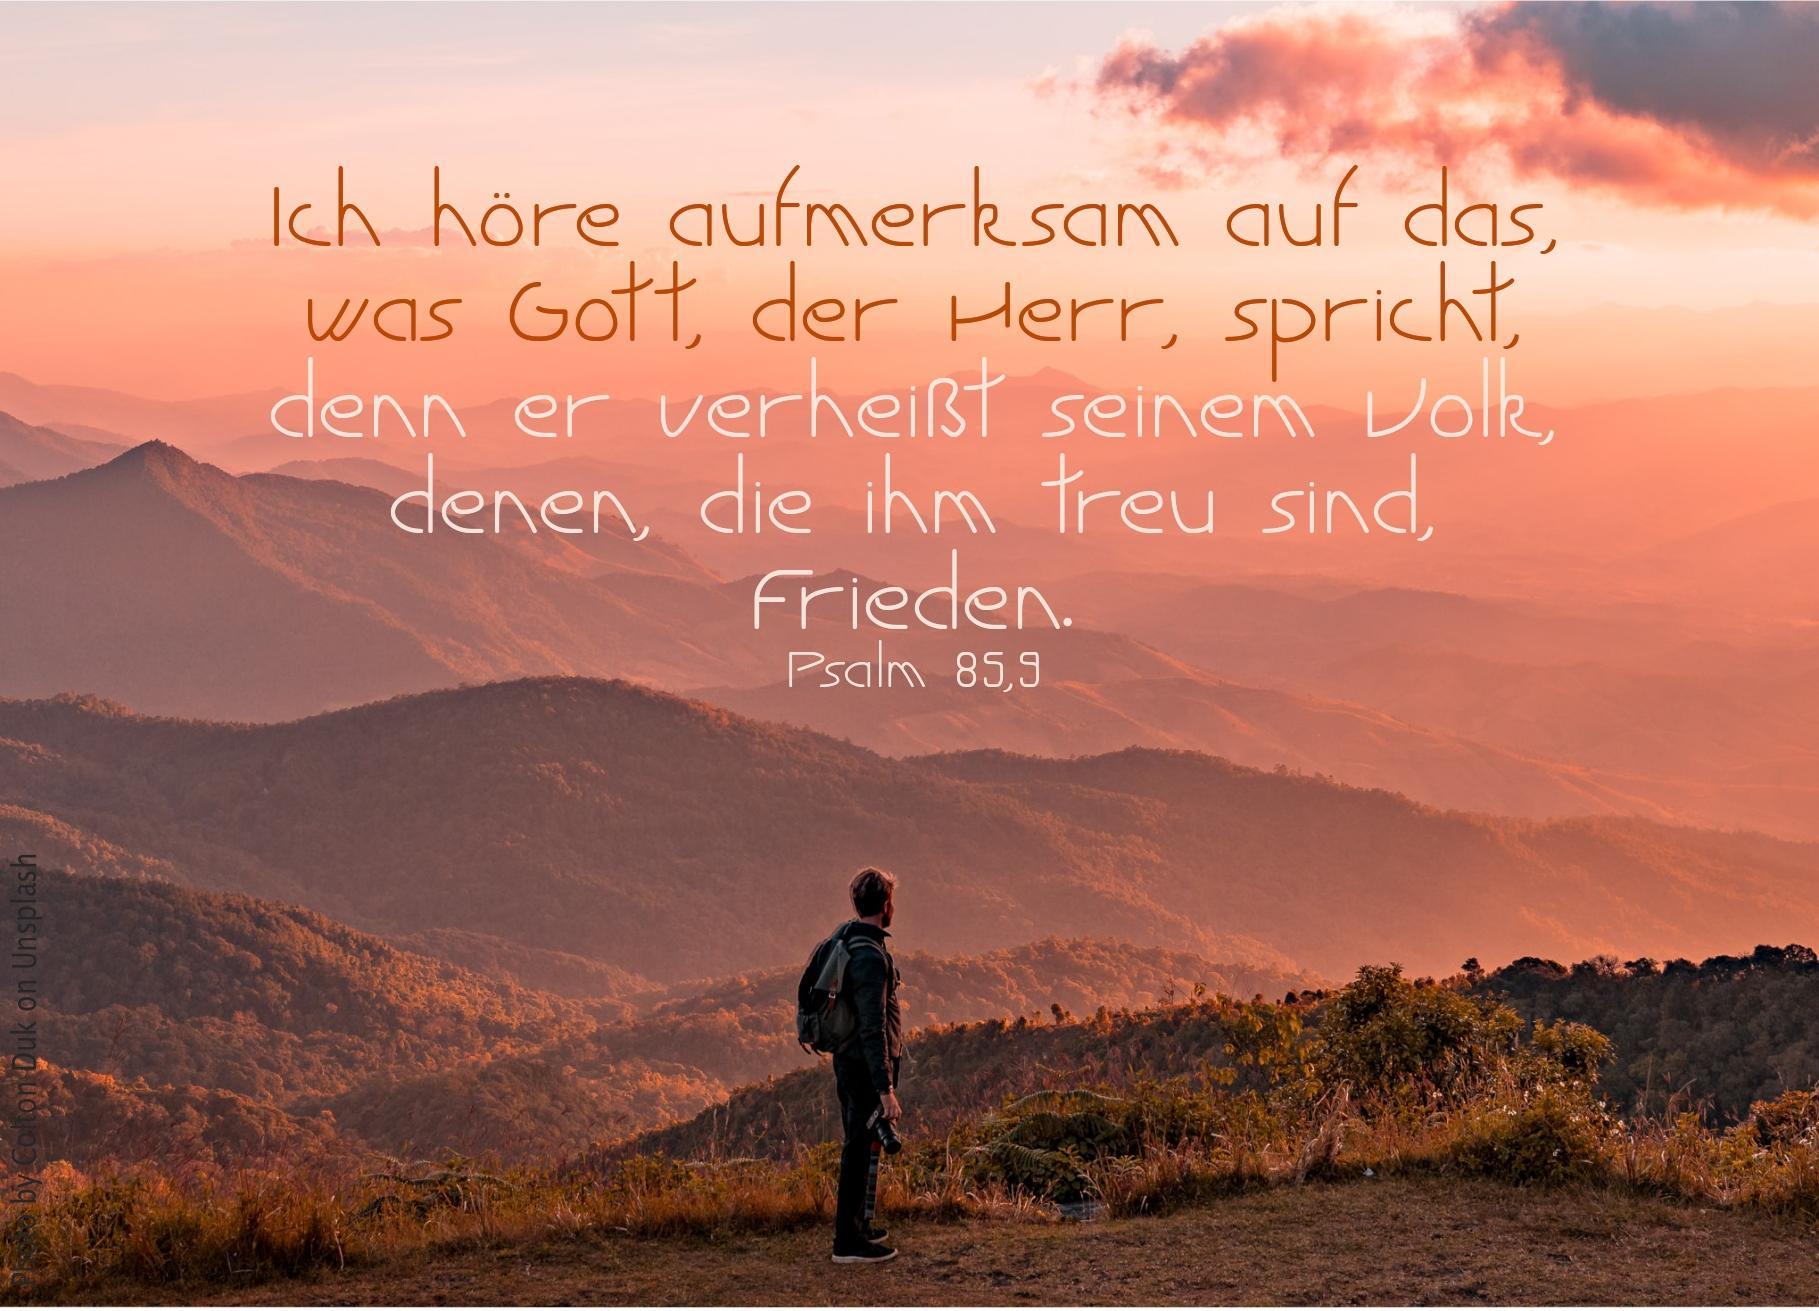 "alt=""berglandschaft_im_morgenrot_erwartet_bibelhoerbuch_jeremia_entkommt_dem_tod"""